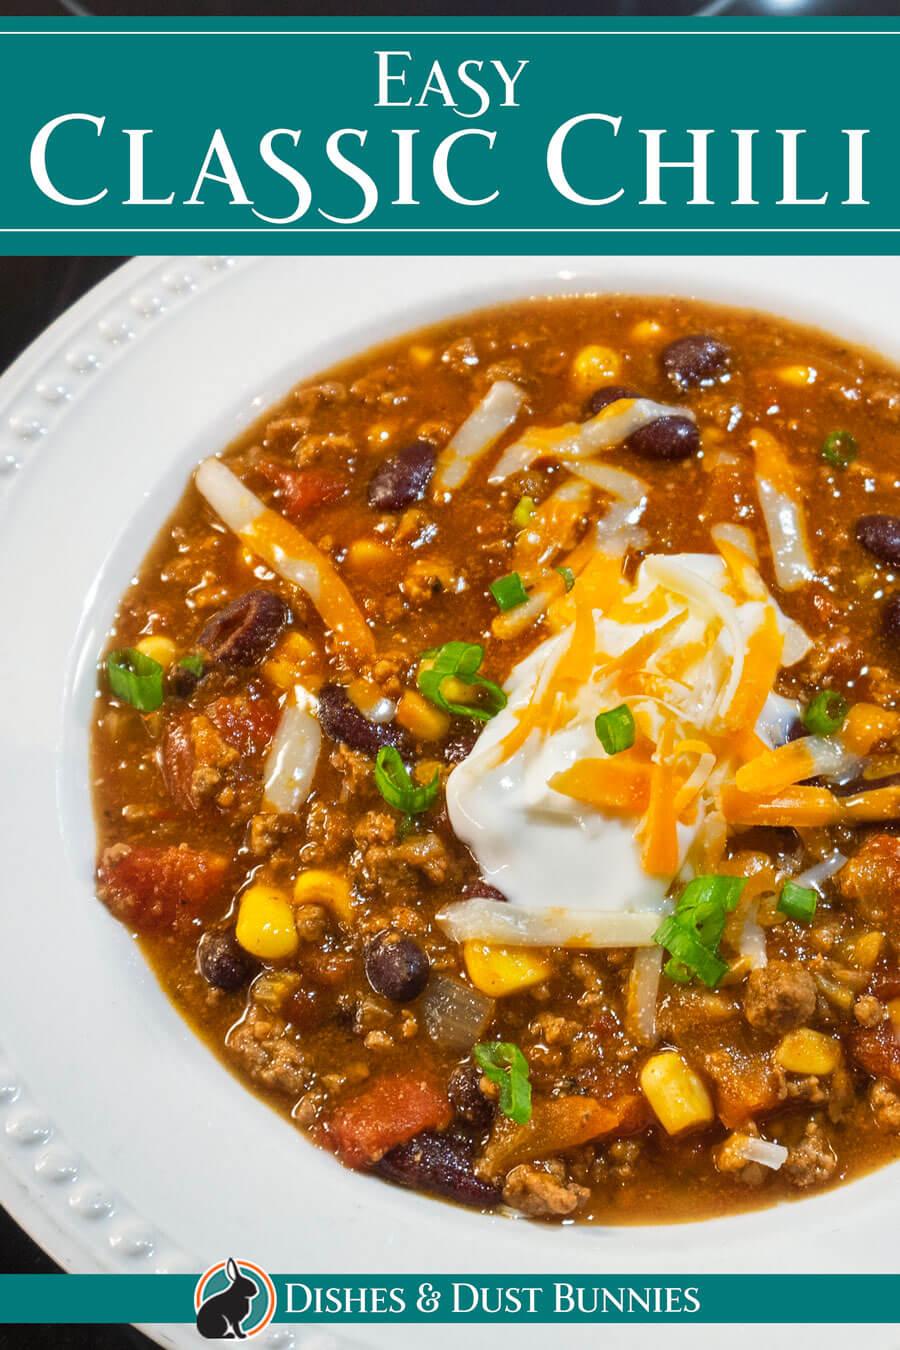 Easy Classic Homemade Chili